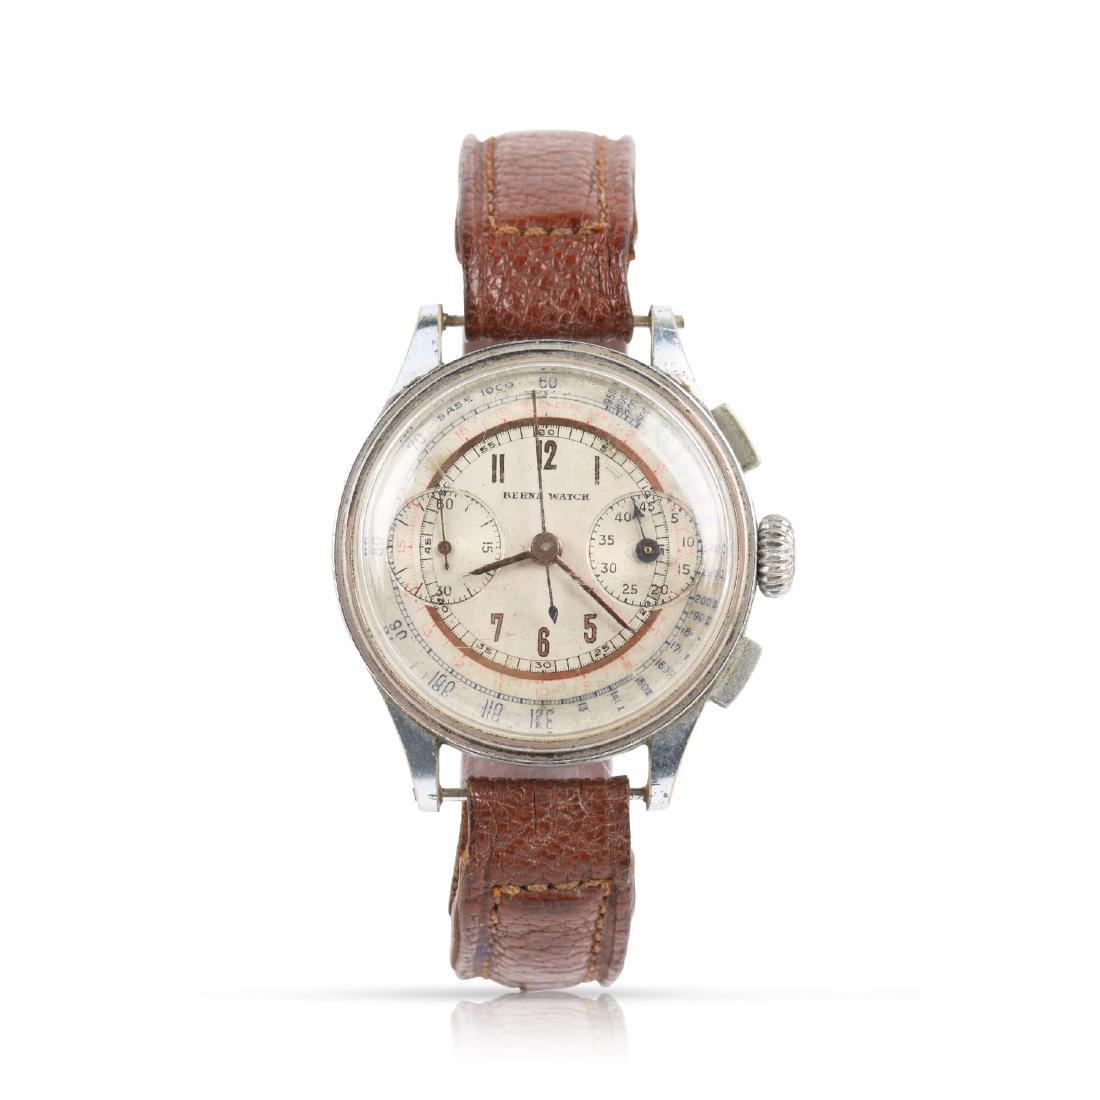 Berna Watch Co., Two-Register Chronograph